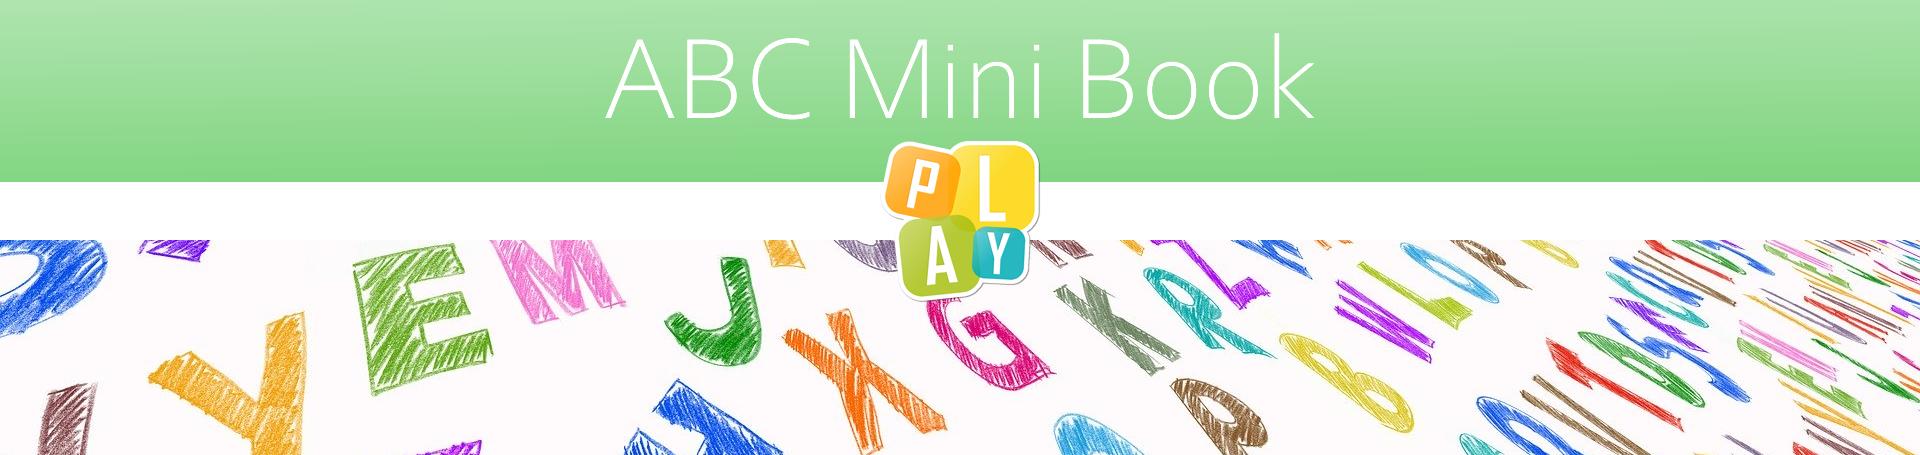 Header ABC Mini Book